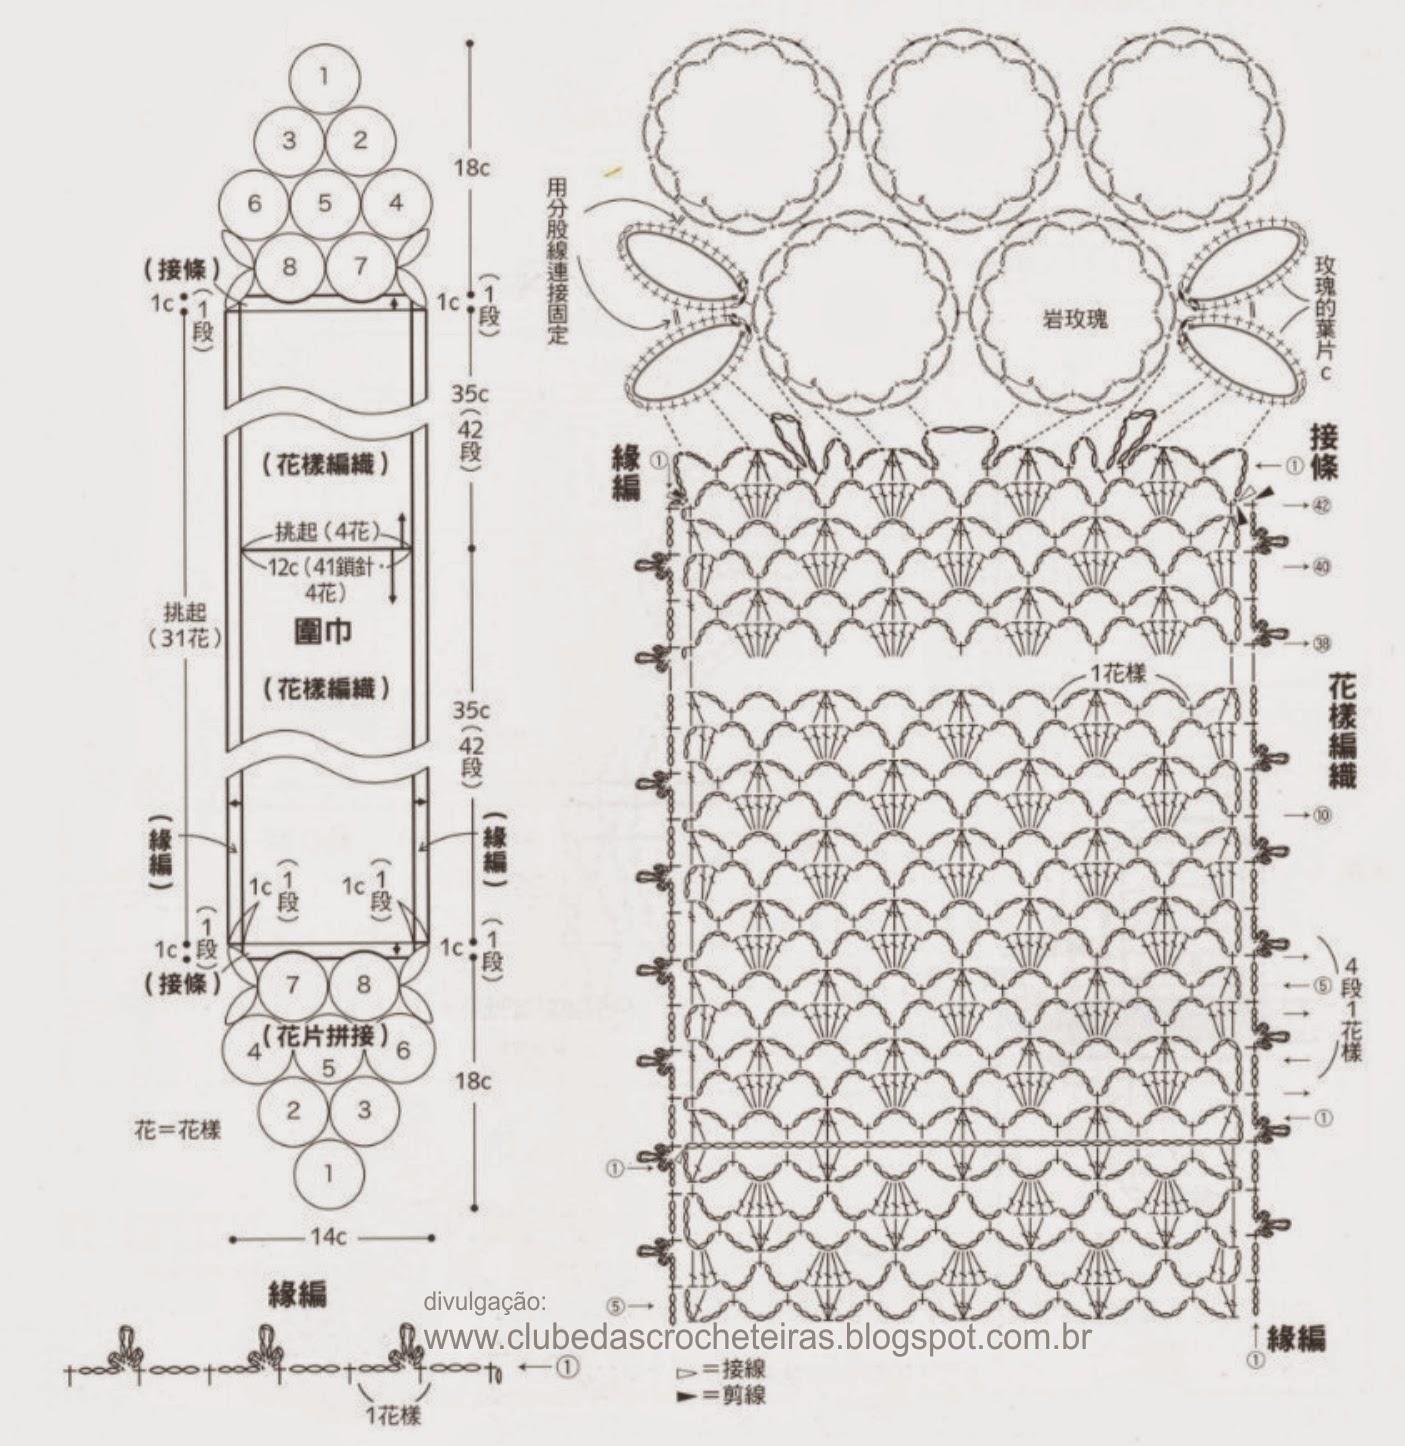 ergahandmade: Crochet Scarf + Diagrams